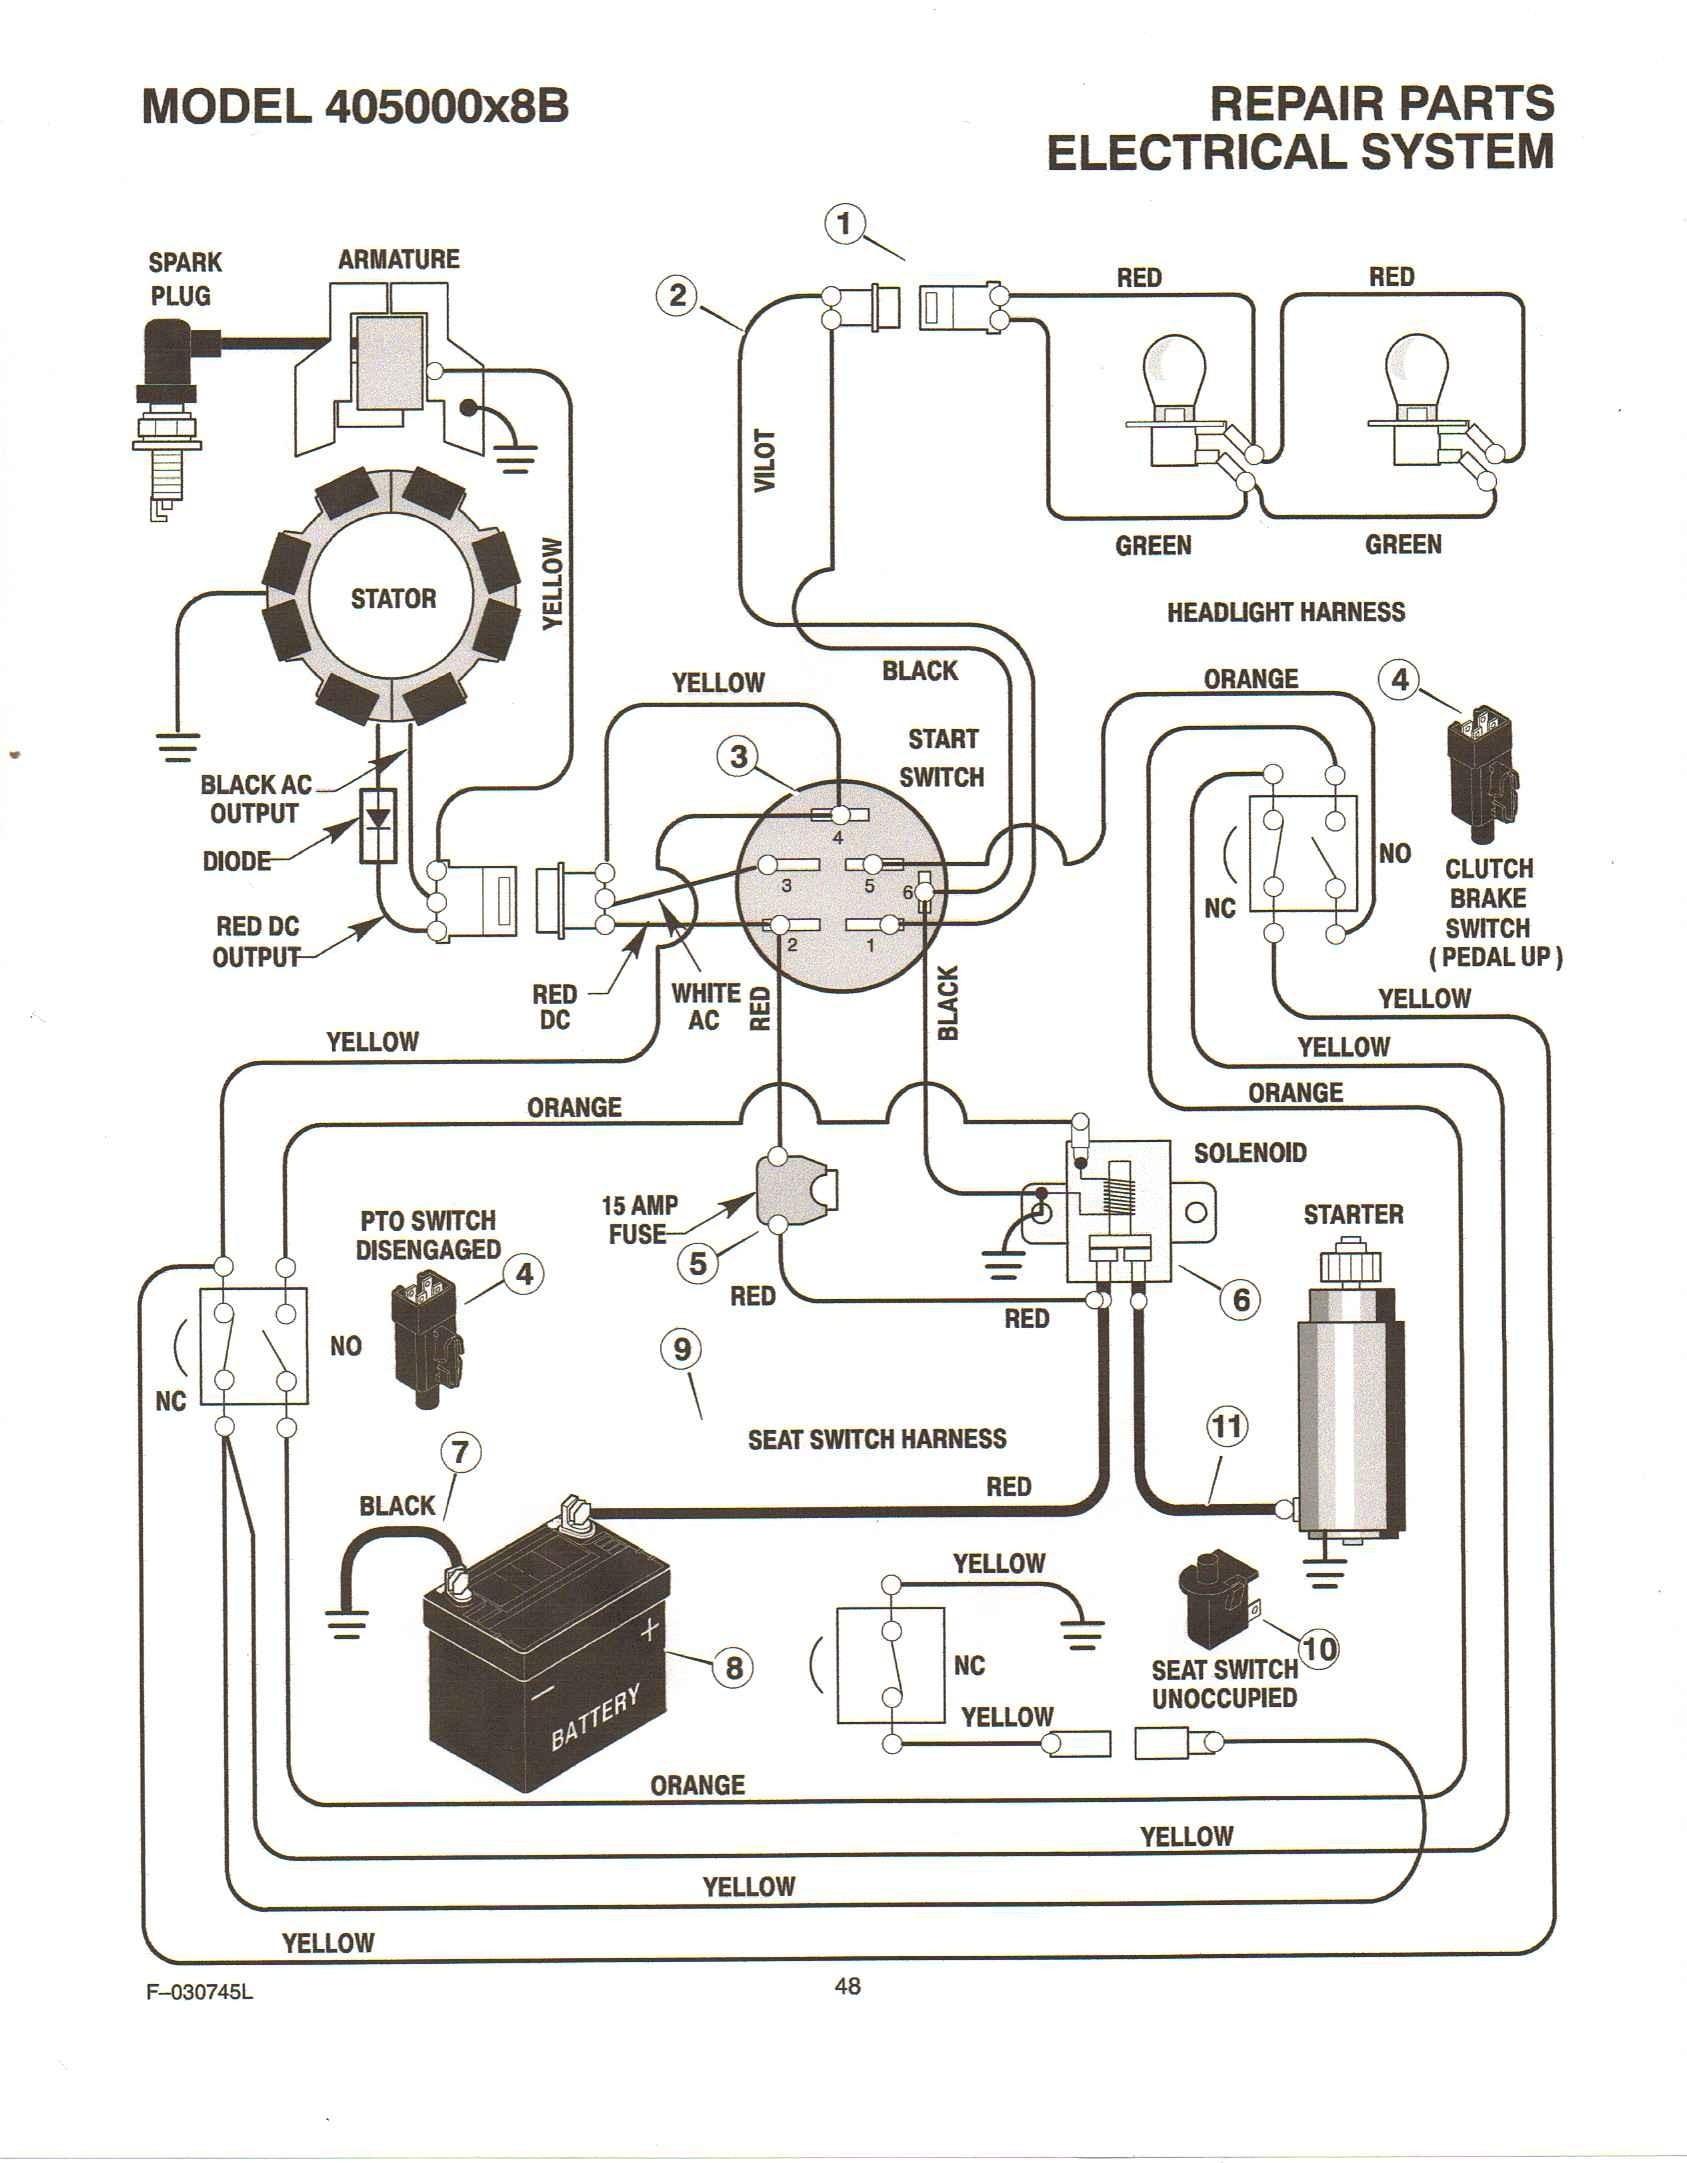 Briggs and Stratton Engine Diagram Kohler Ignition Switch Wiring Diagram Best Wiring Diagram for Kohler Of Briggs and Stratton Engine Diagram